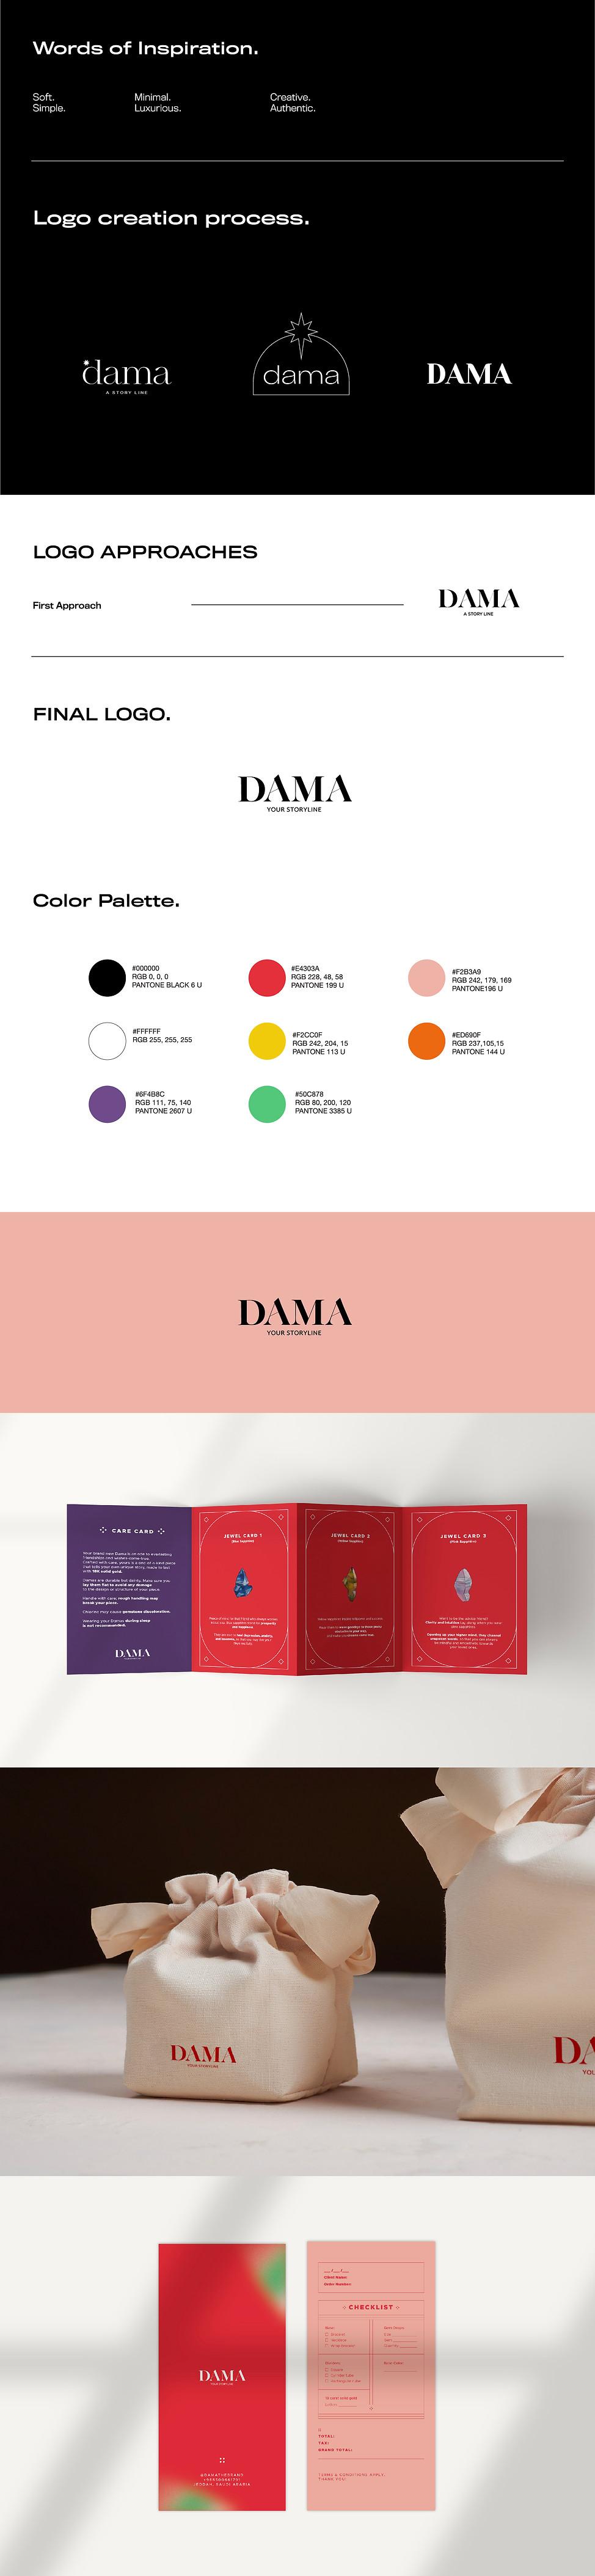 Dama _ PROCESS-01.jpg